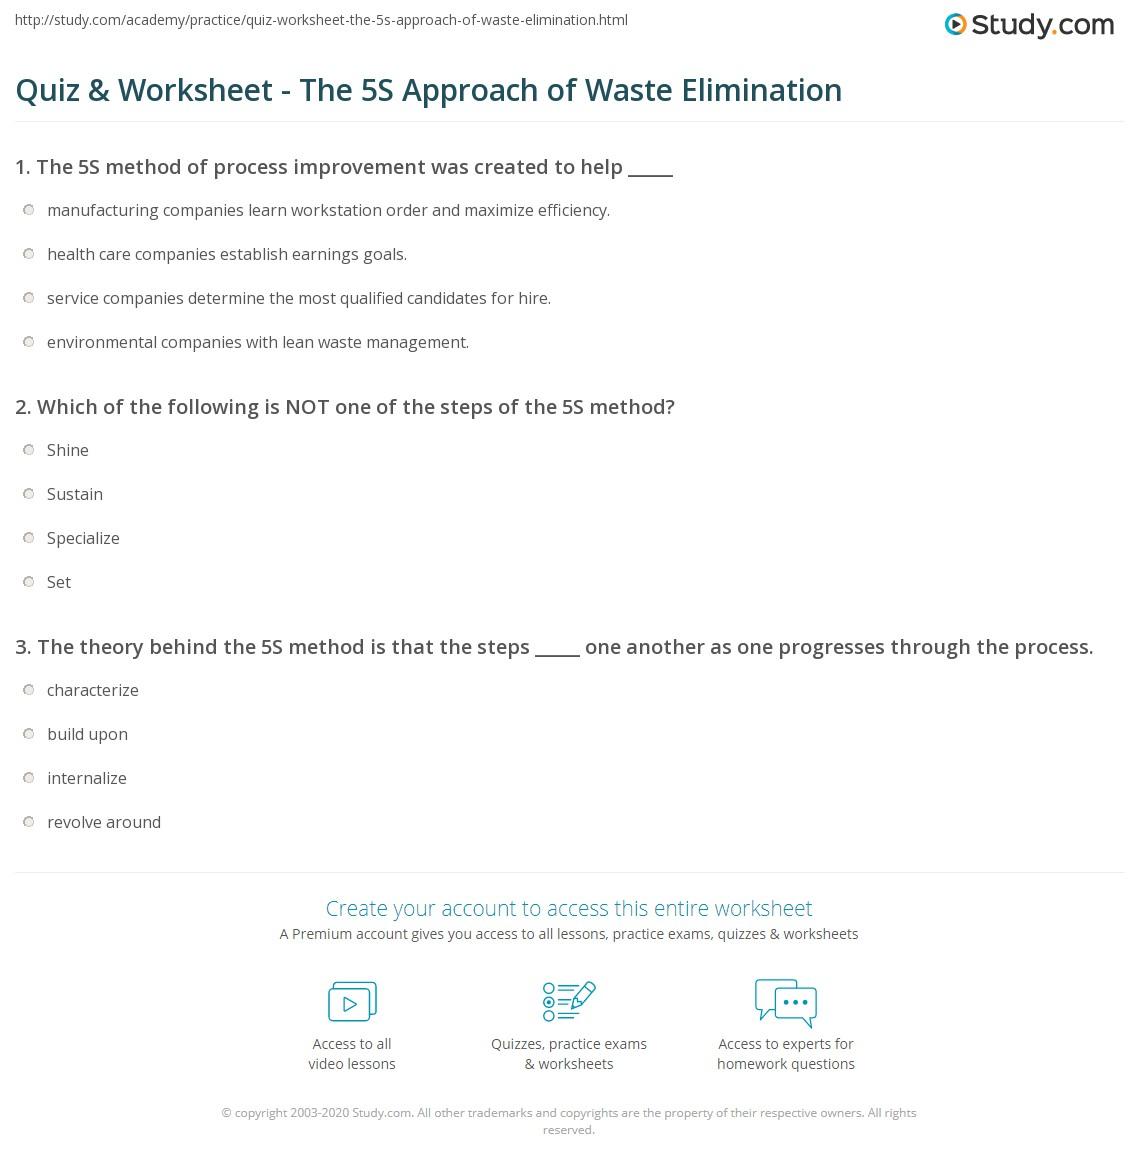 Lean 5s Worksheet : Quiz worksheet the s approach of waste elimination